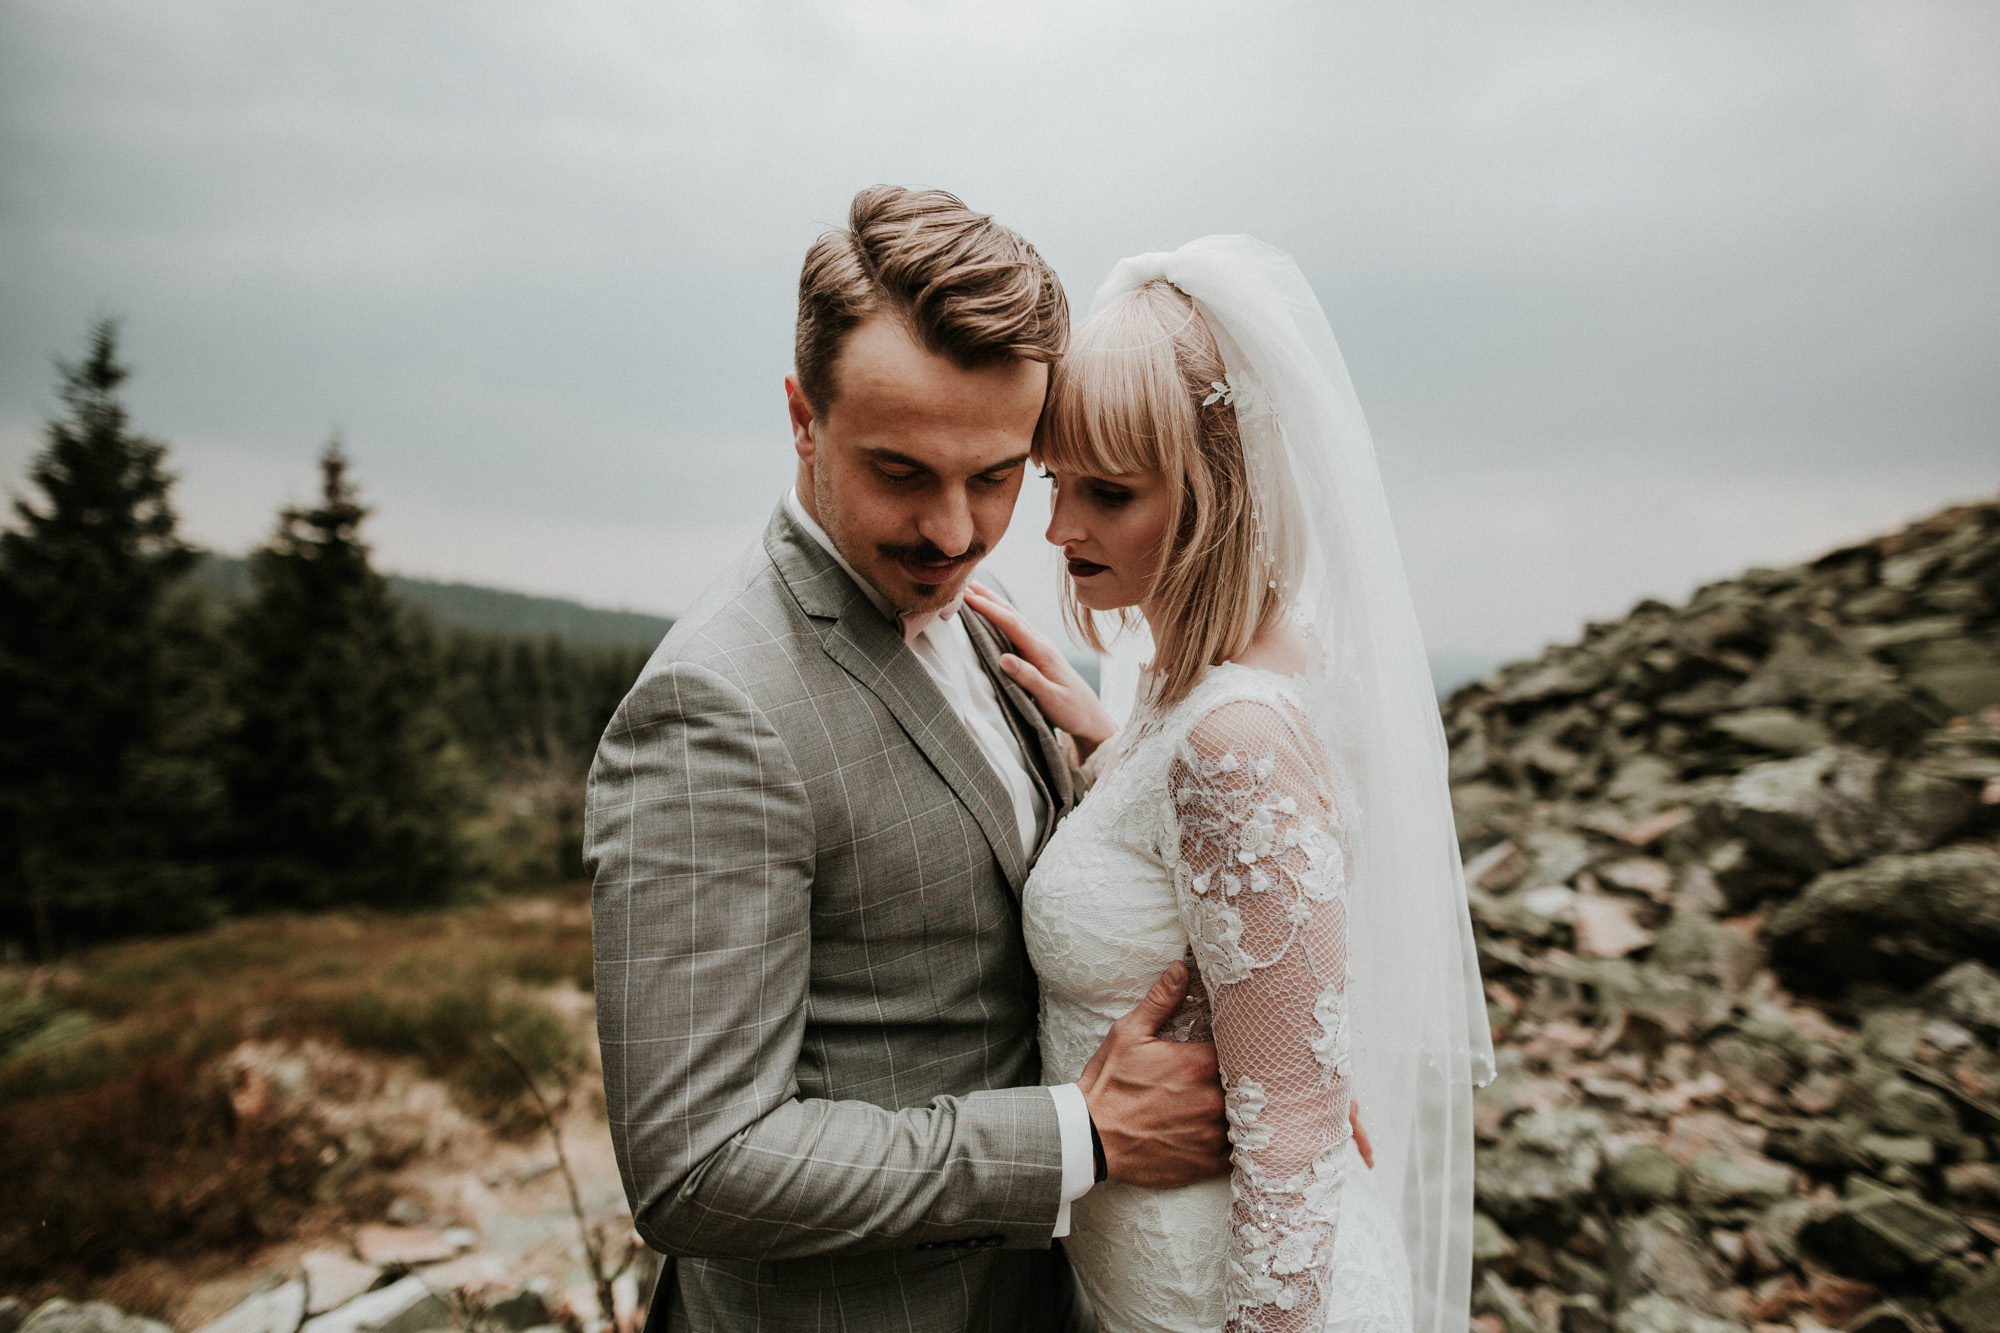 DanielaMarquardtPhotography_Hochzeitsfotograf_Düsseldorf_Köln_Mallorca_Bayern_Austria_Harz_LinaundMaik_Afterwedding-Shooting_Weddingphotographer_Ibiza_Tuskany_Italien_Toskana93